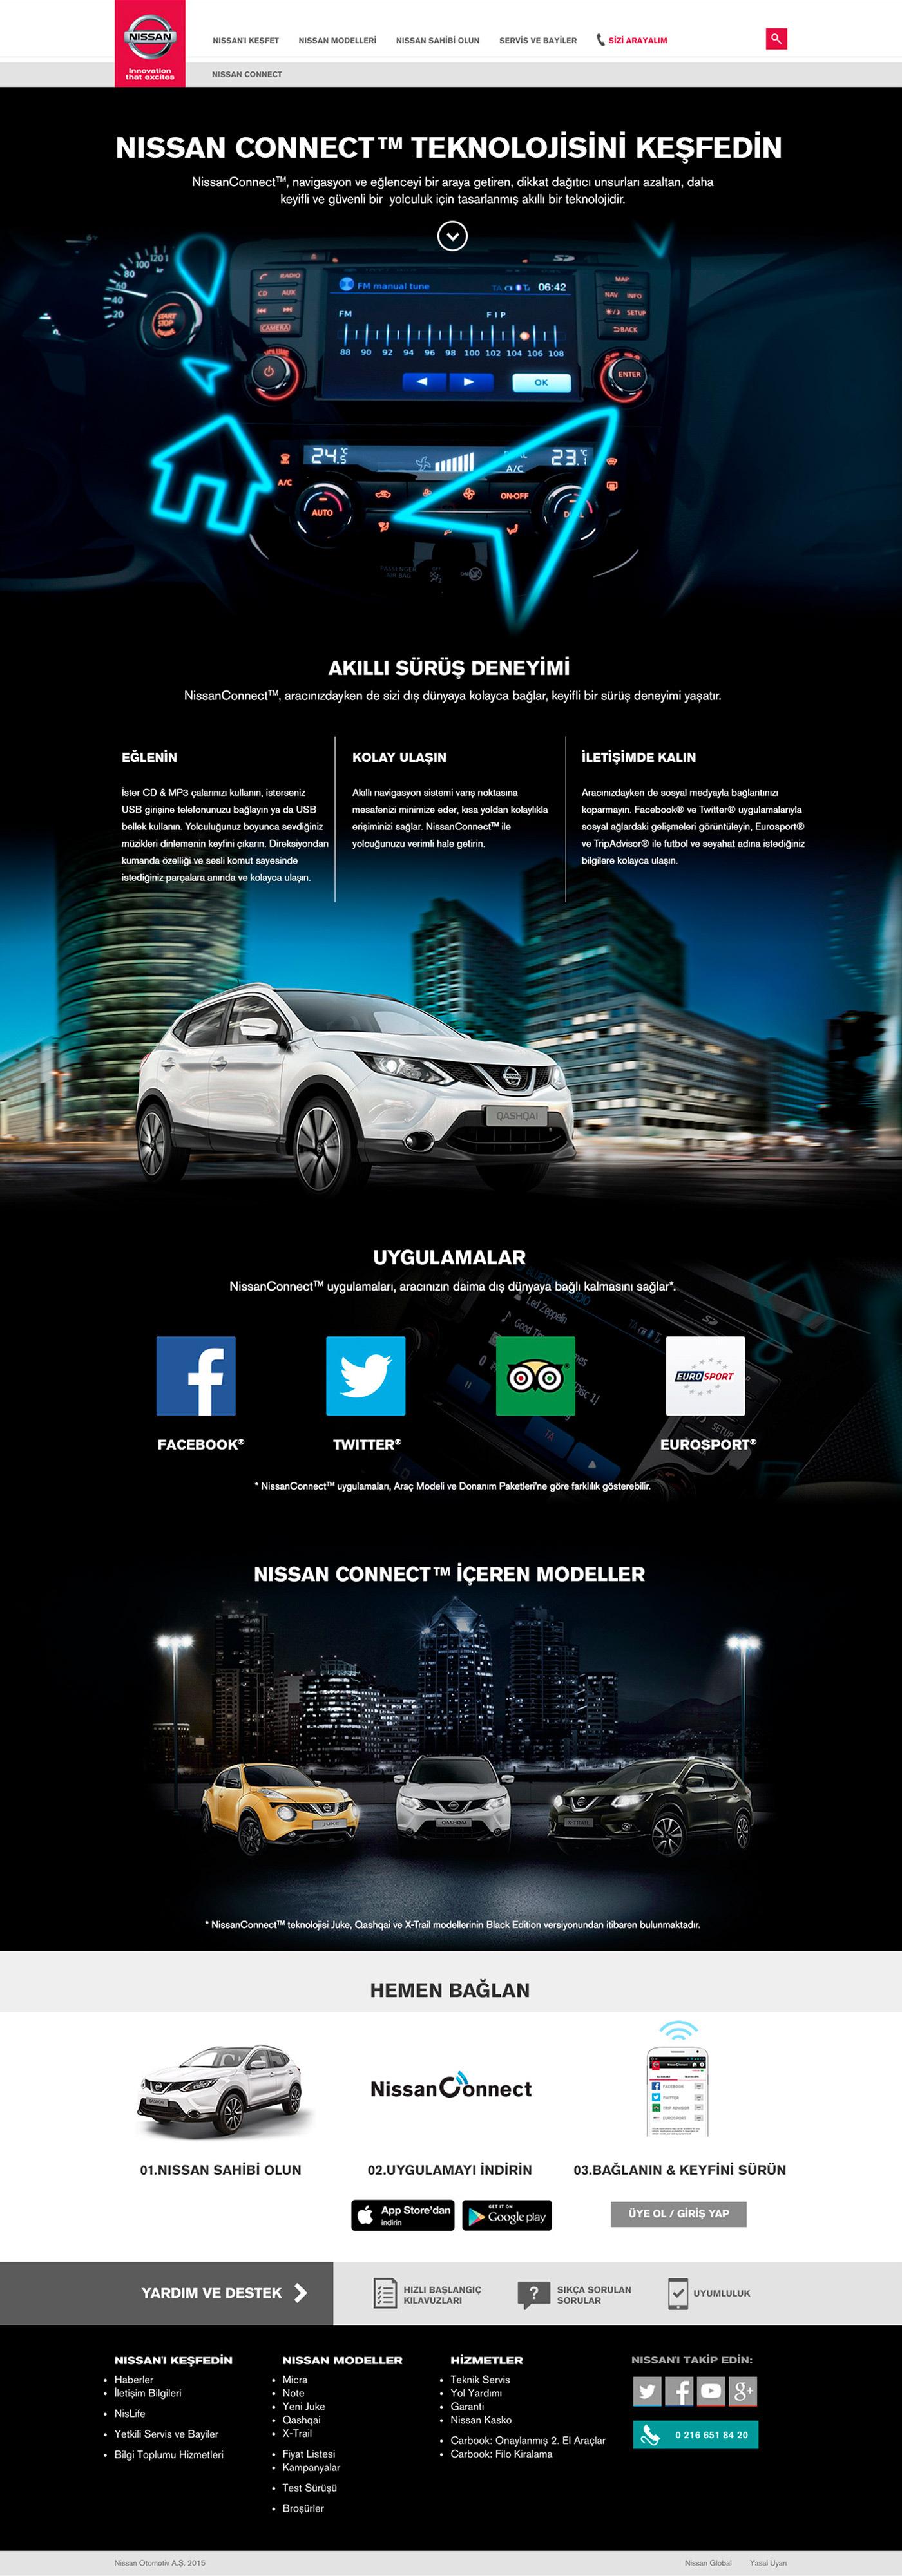 Adobe Portfolio Nissan GT Academy Gran Turismo NissanConnect Juke Rhythm Nissan Juke